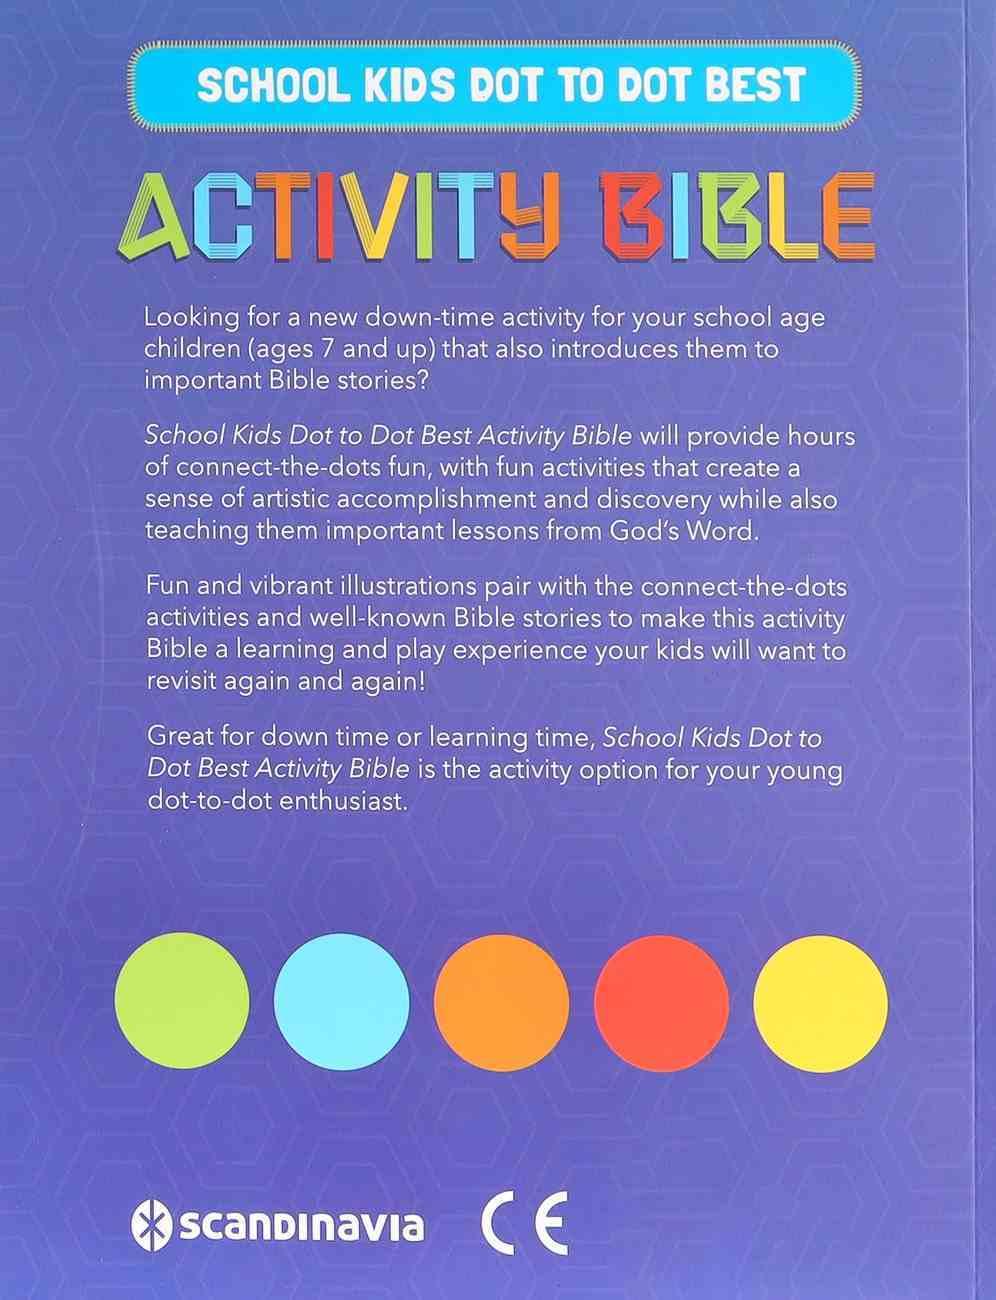 School Kids Dot to Dot Best Activity Bible (Ages 7-11) Paperback